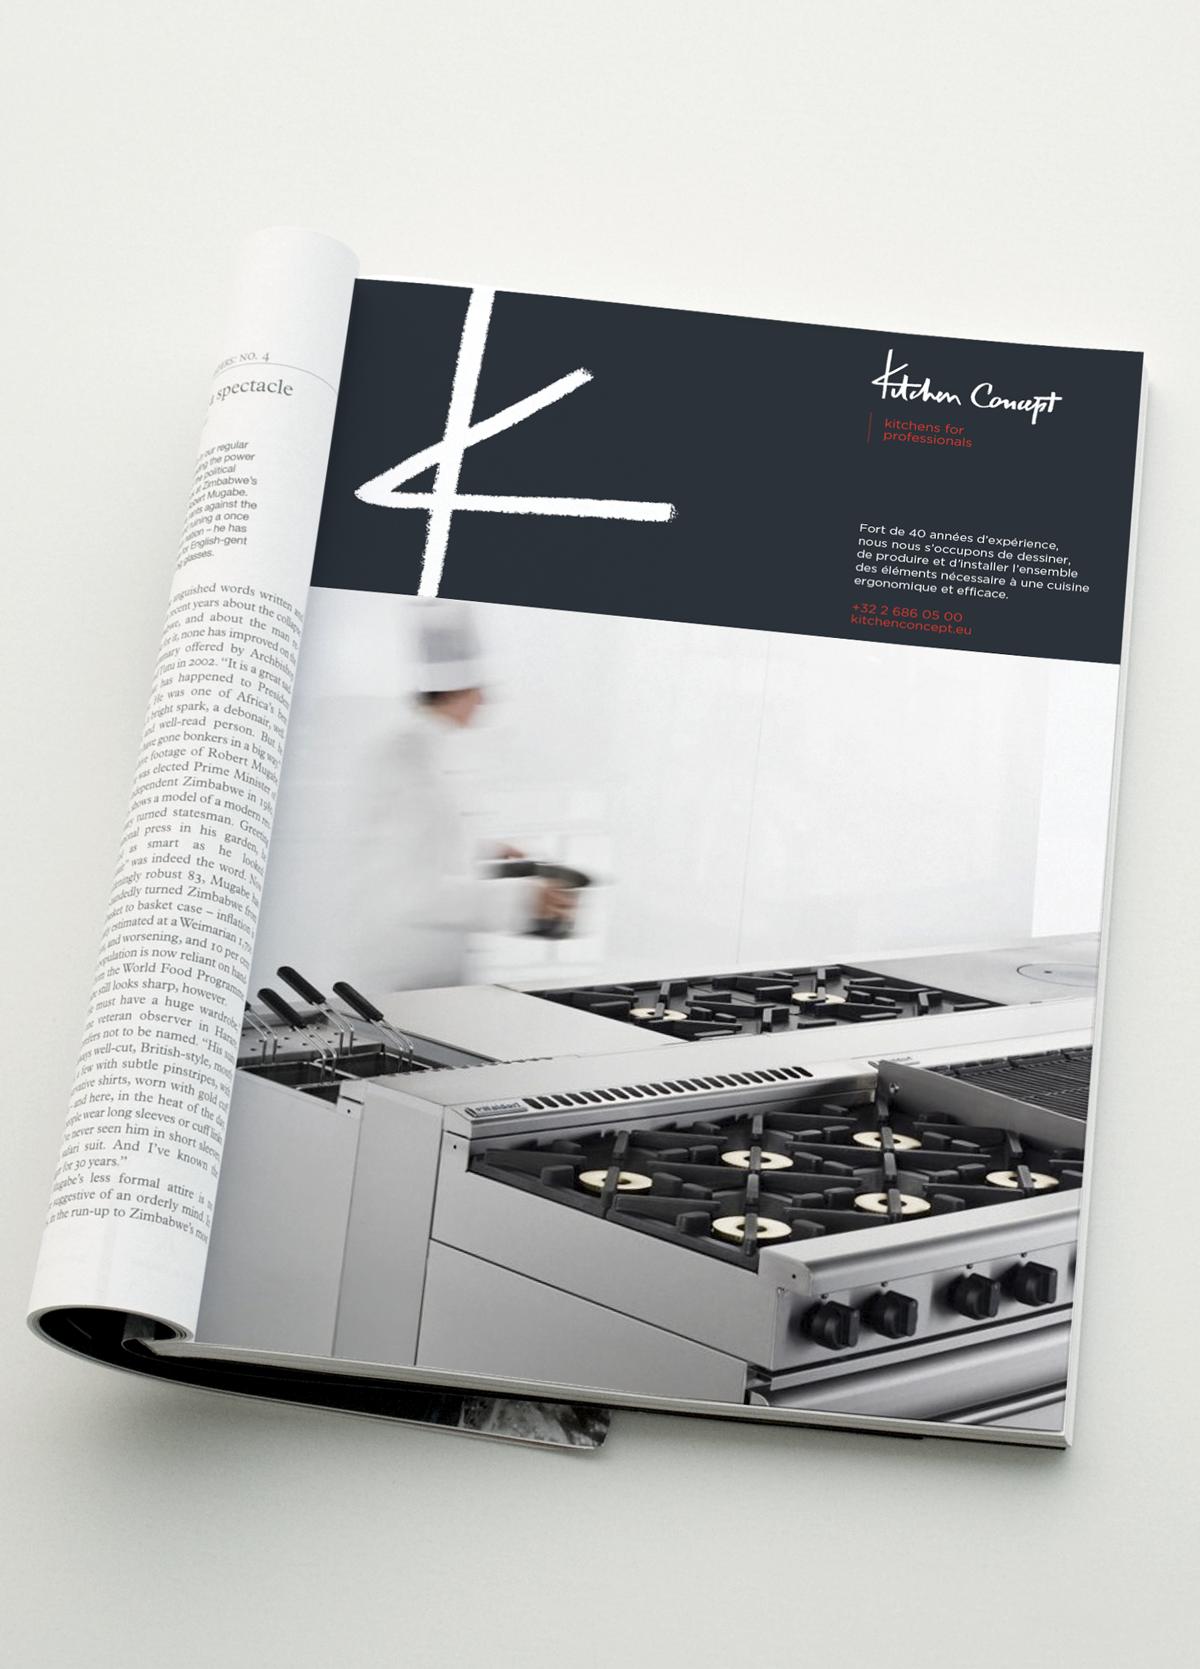 Vlevle-Kitchen_Concept-Visual_Identity-magazine-logo-graphic_design-gaelle_de_laveleye